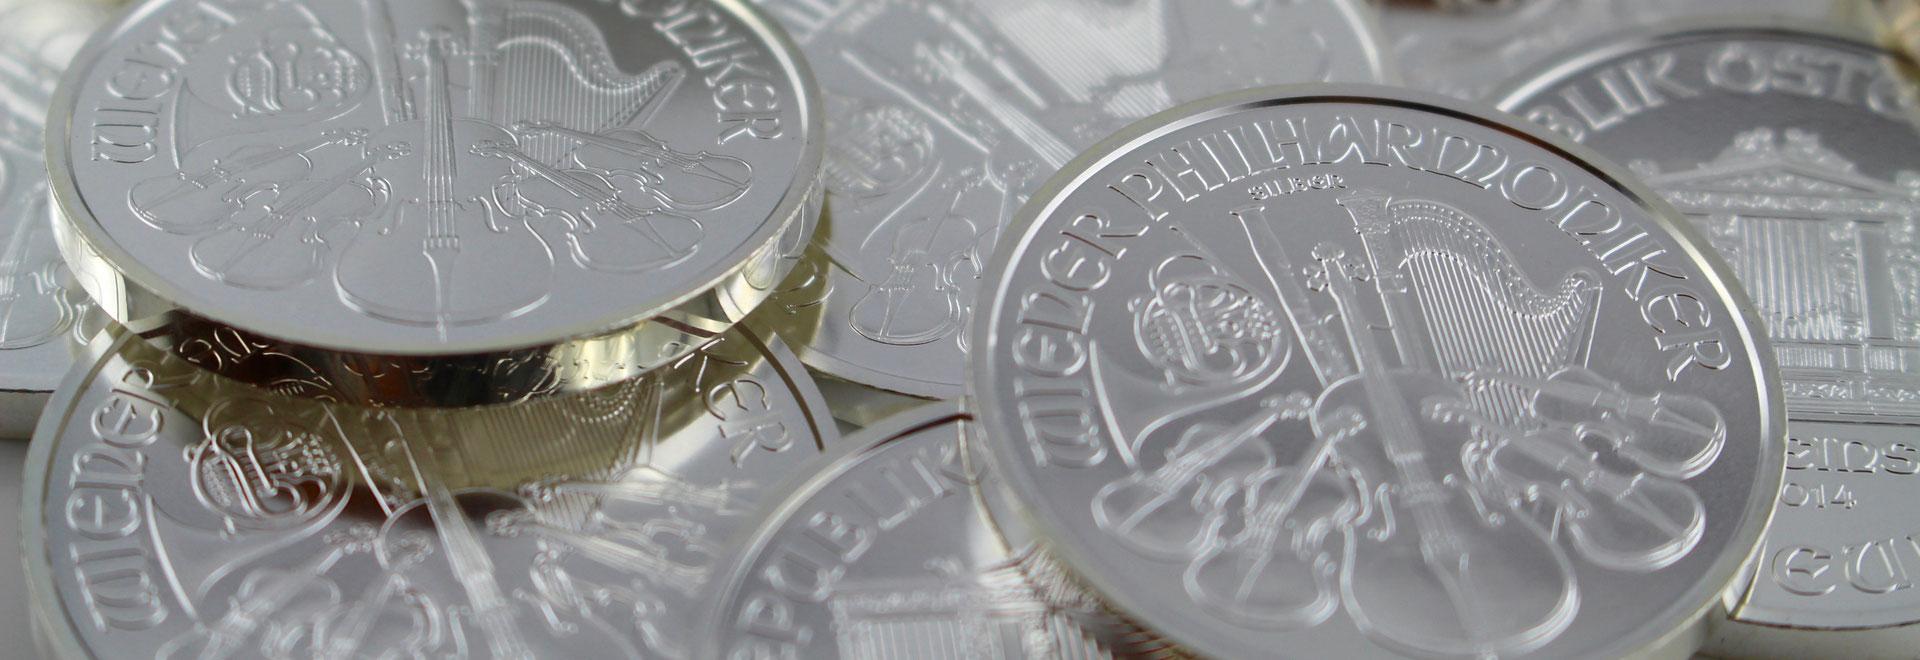 Münzhandlung Münzen Ankauf Münzhandel Graz Münze Graz